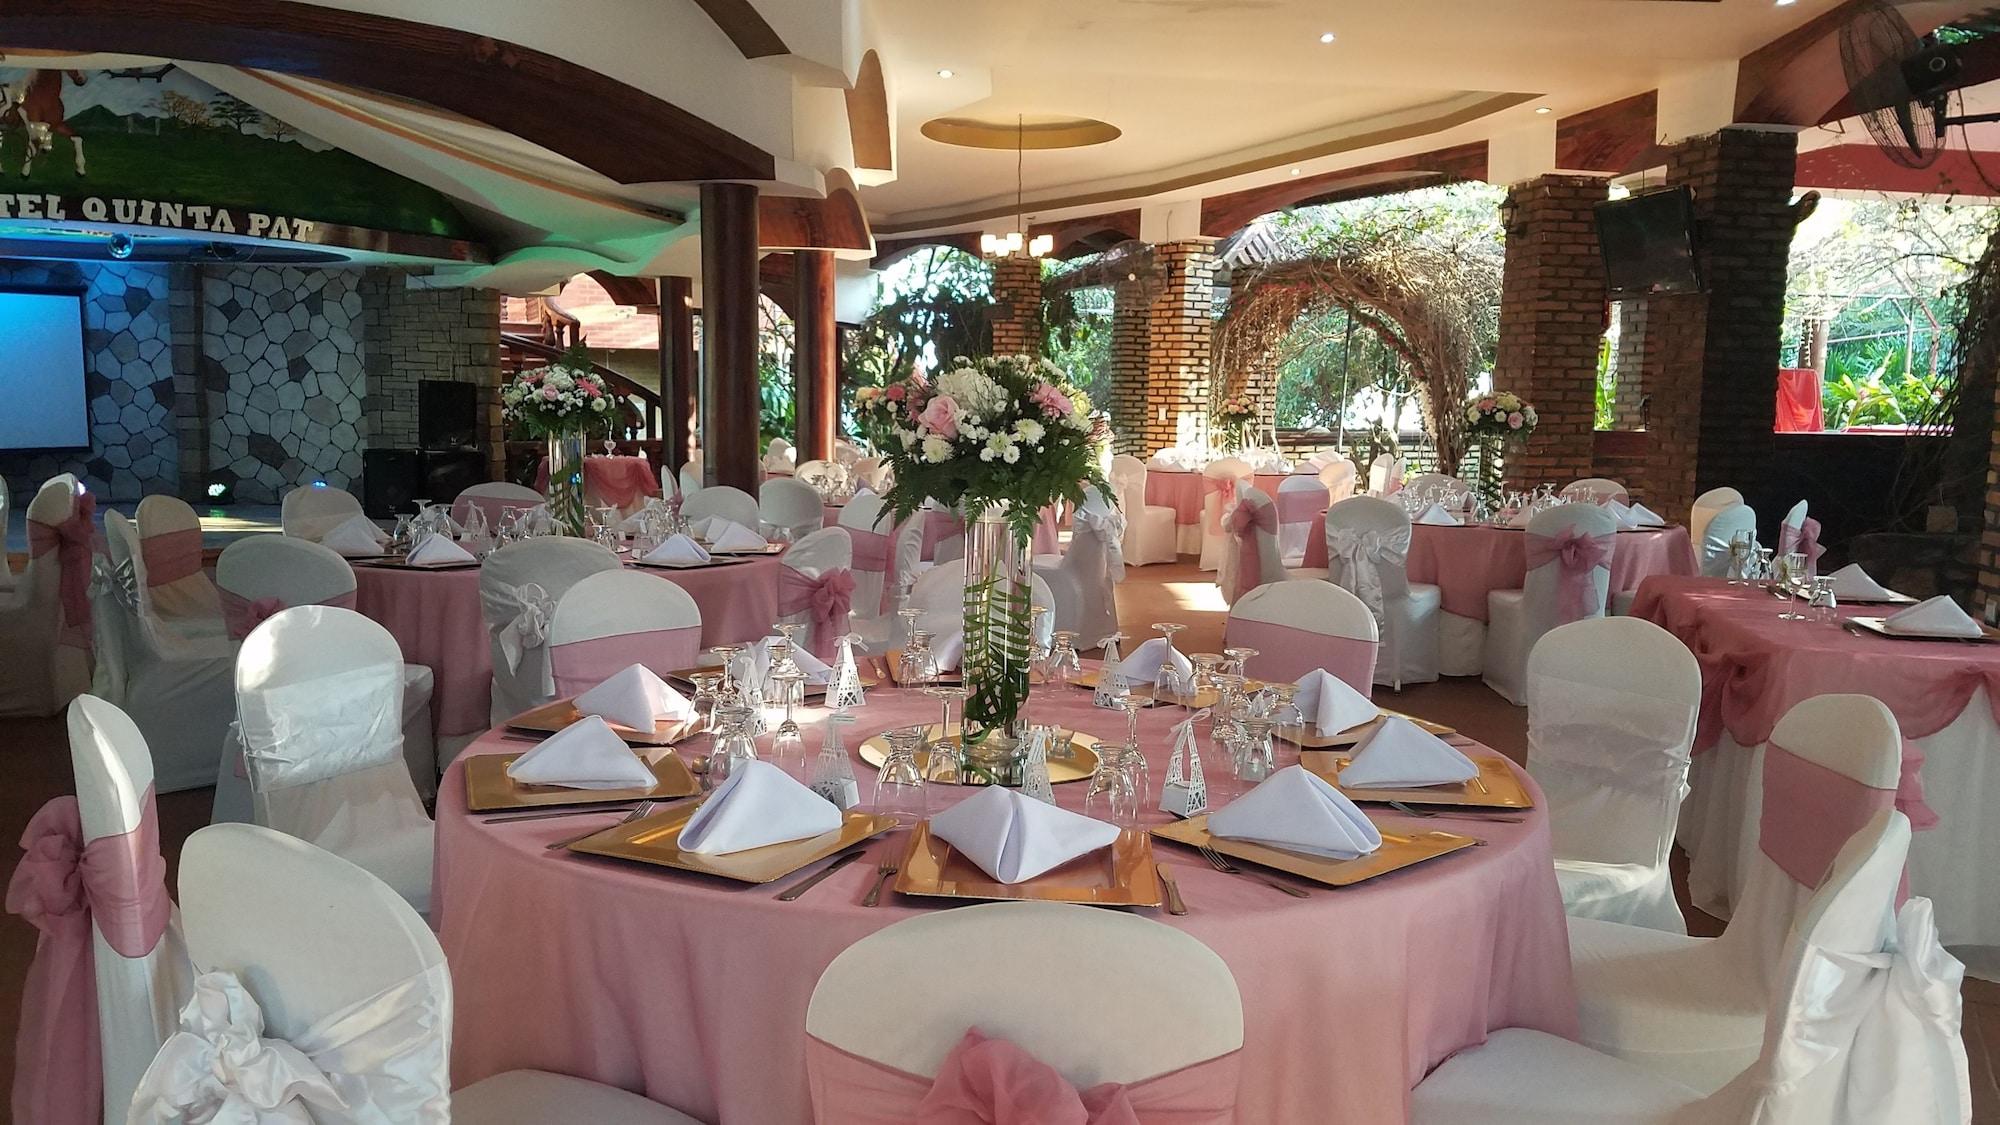 Hotel Quinta Pat. Resort and Restaurant, San Antonio de Oriente